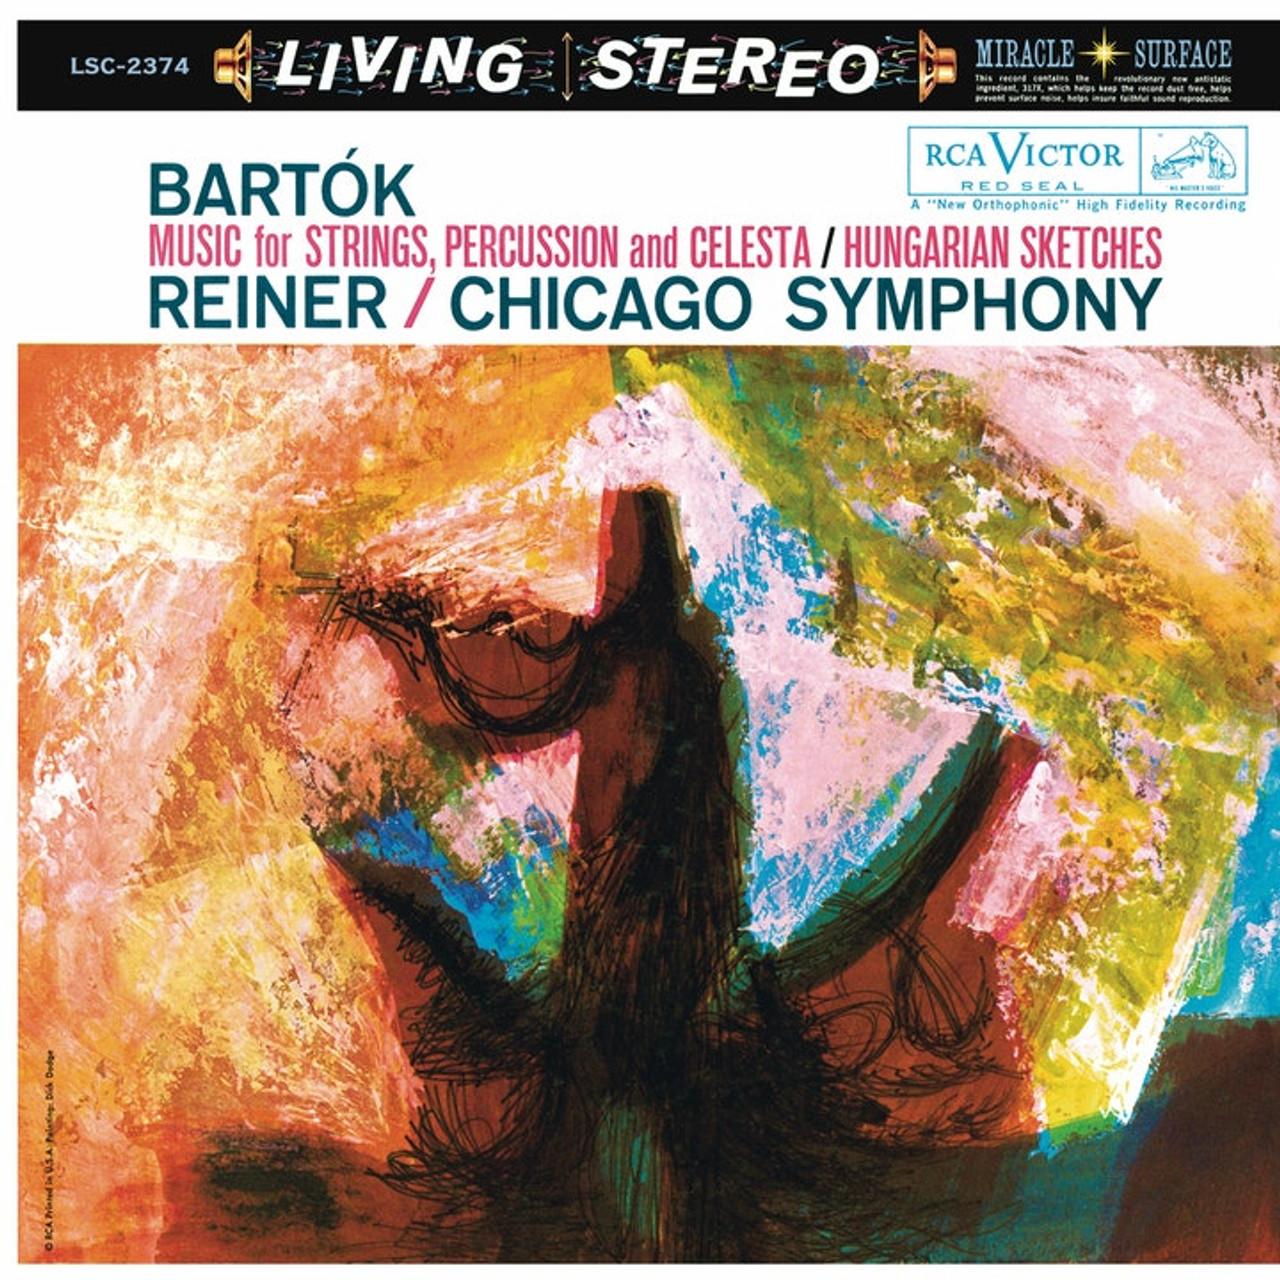 Bartok Music for Strings Percussion Celesta Reiner SD Shaded Dog  LP